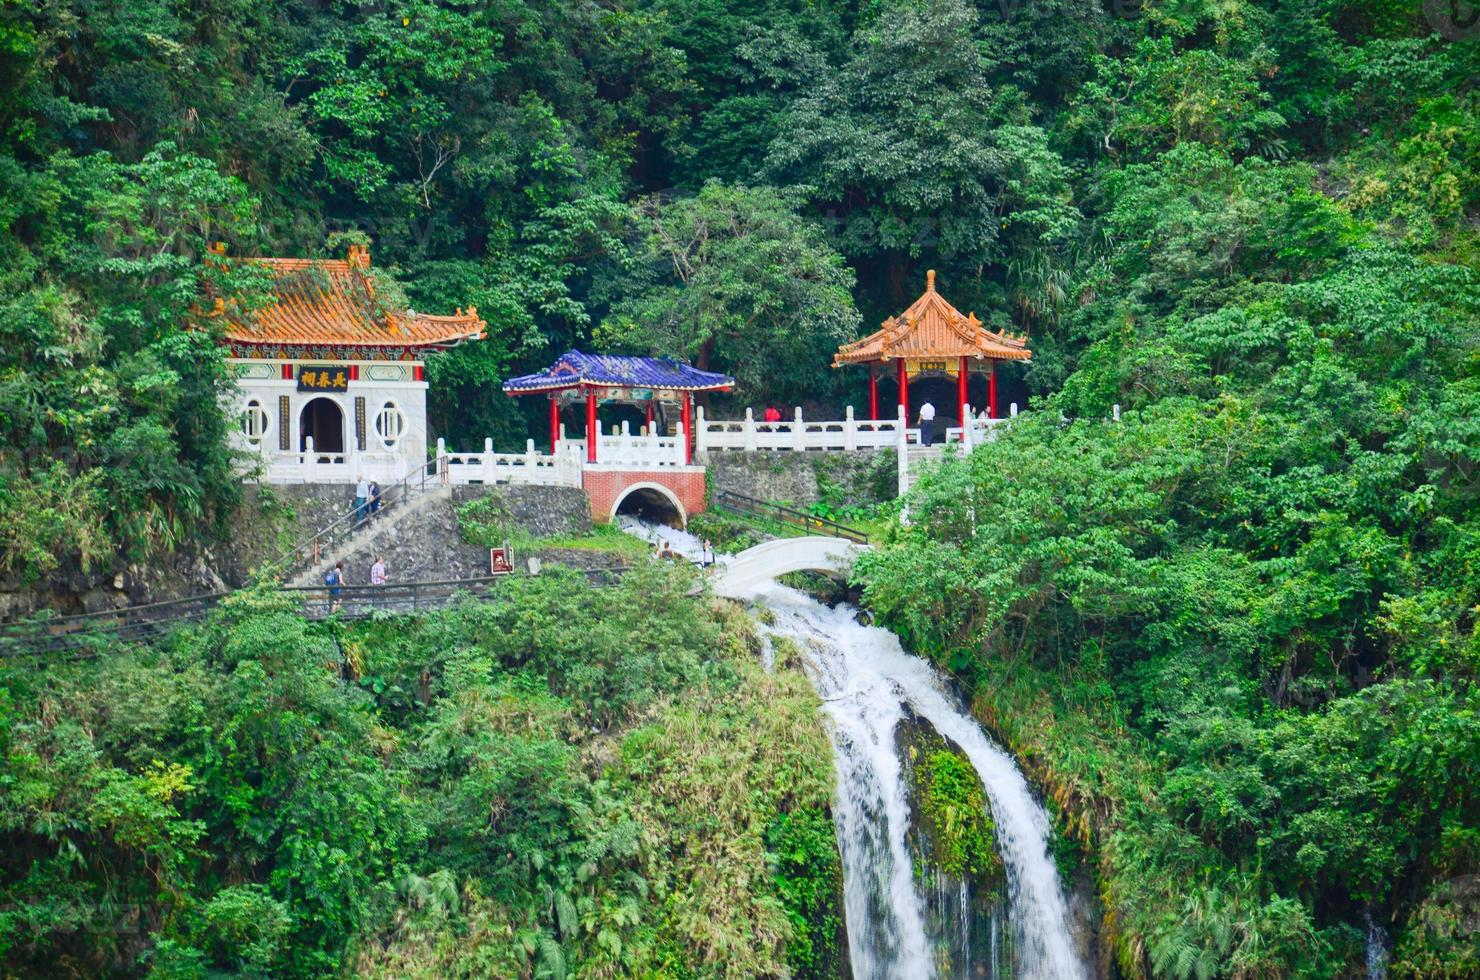 Taiwan Taroko National Park - Changchun (ewiger Frühling) Schrein foto